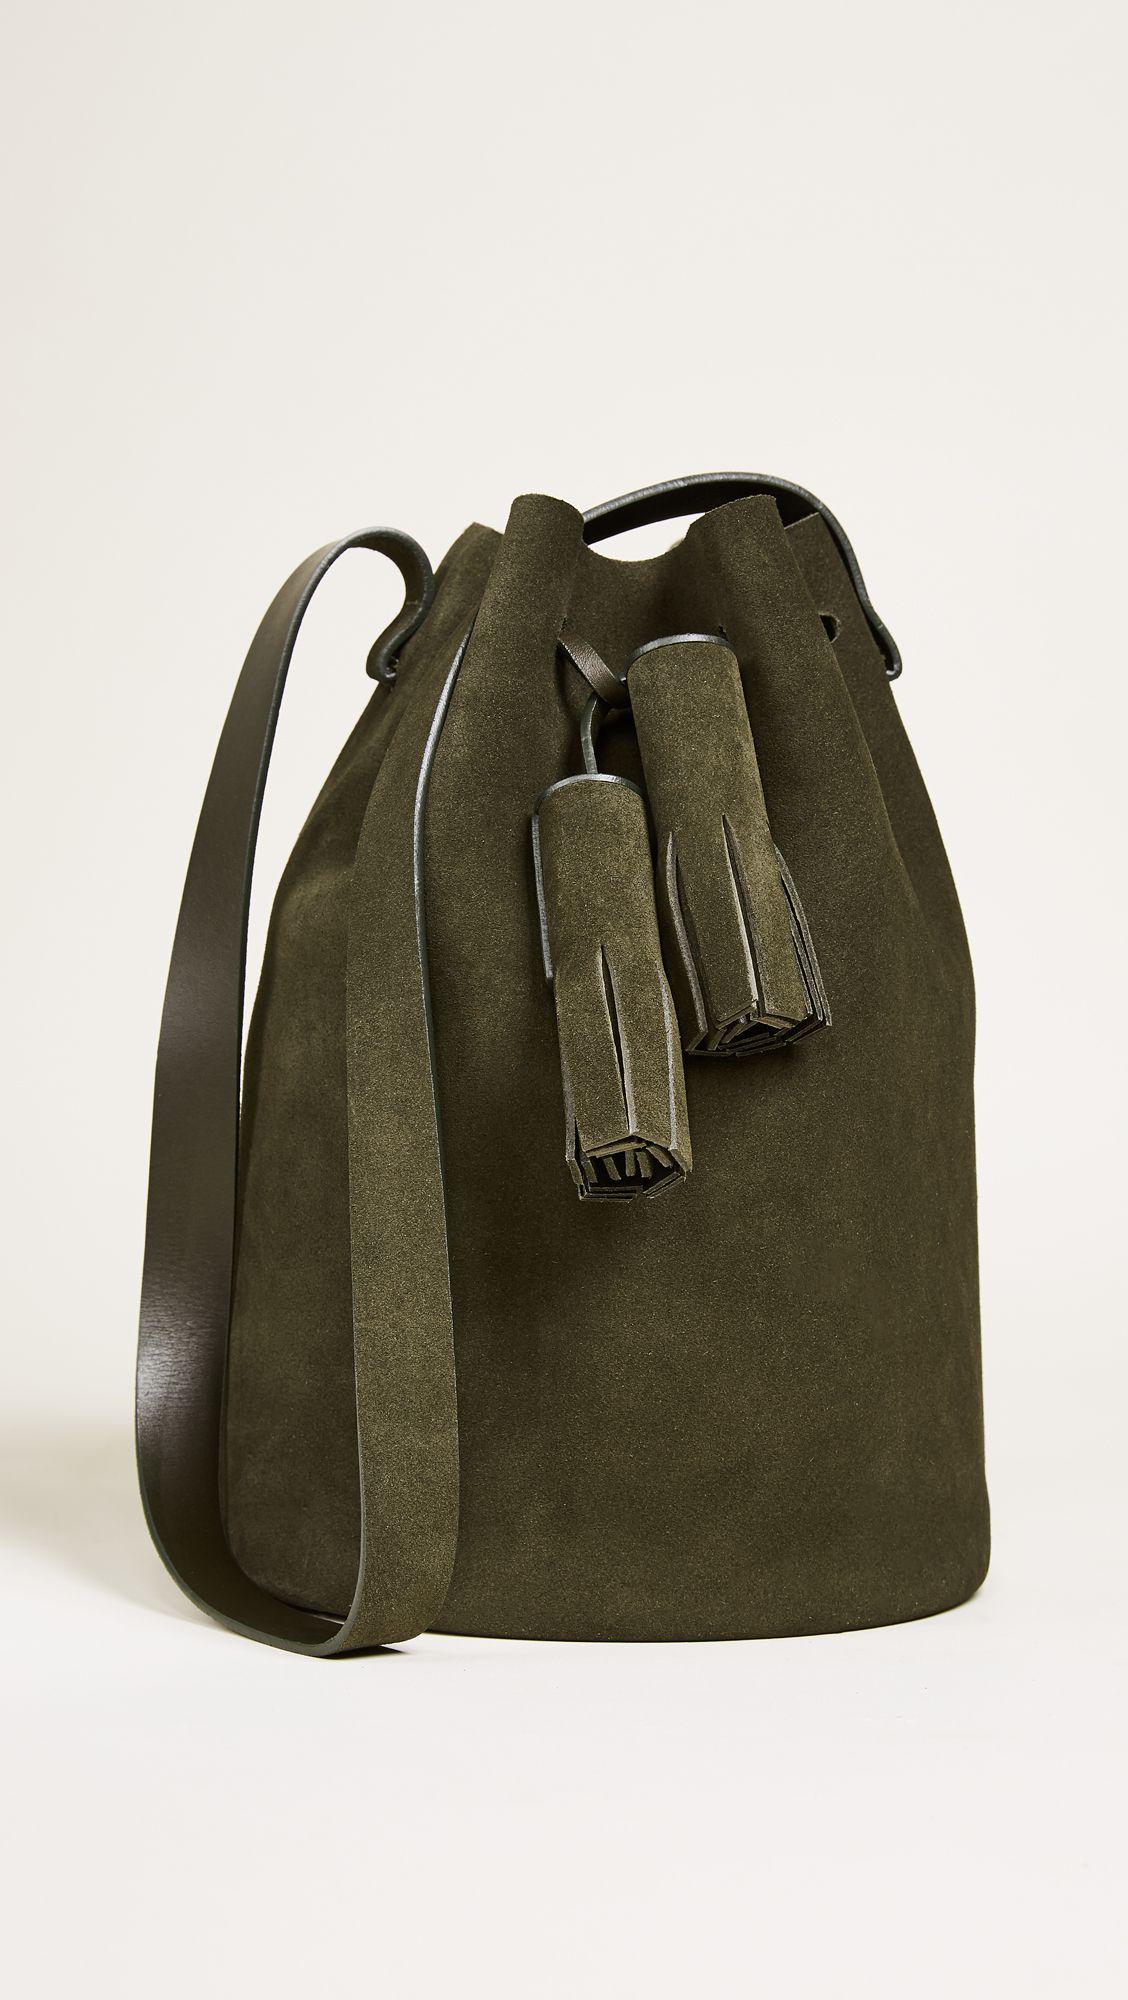 A green suede bucket bag